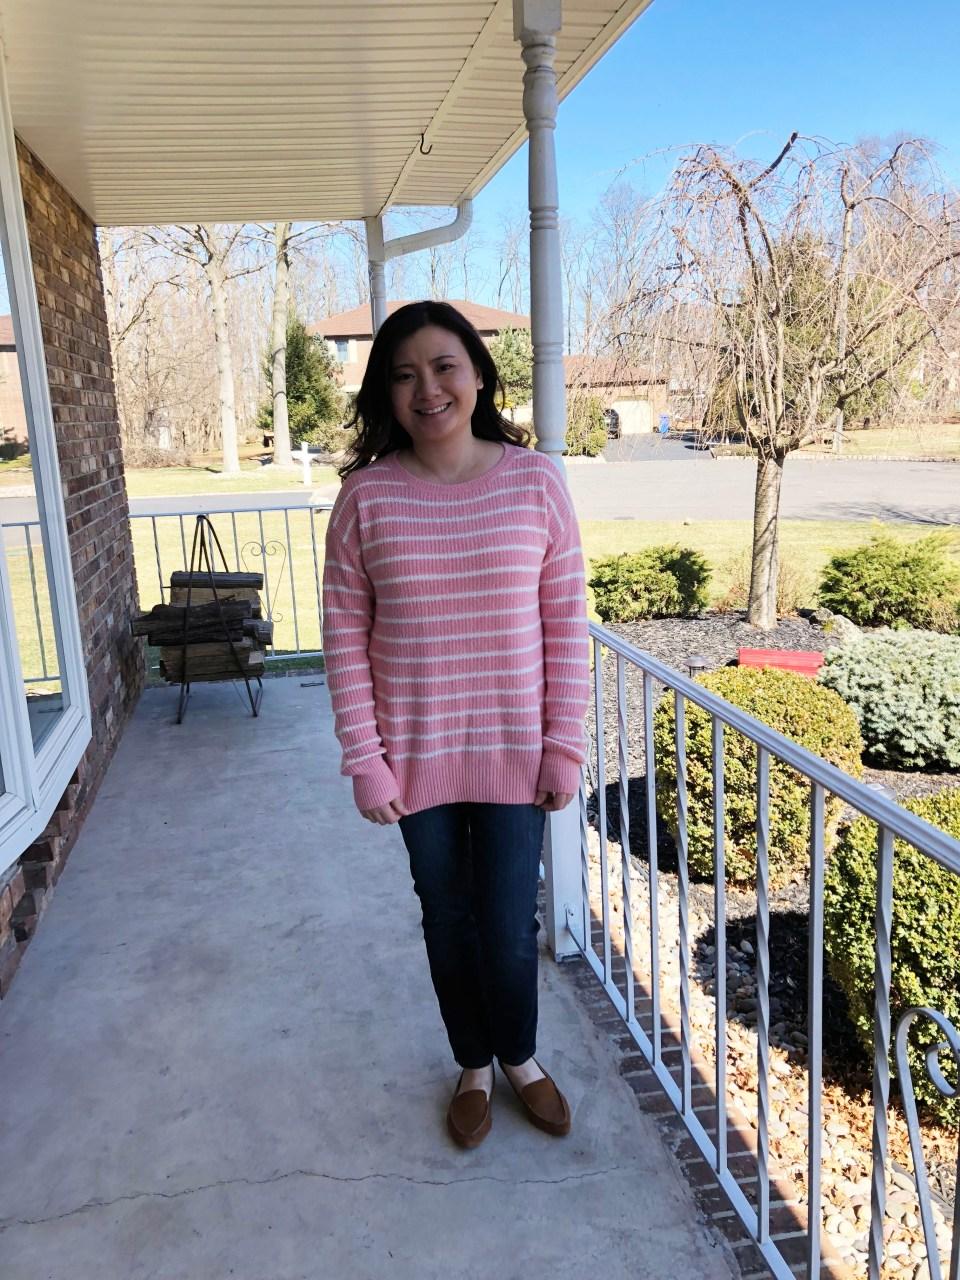 Pink & White Striped Sweater